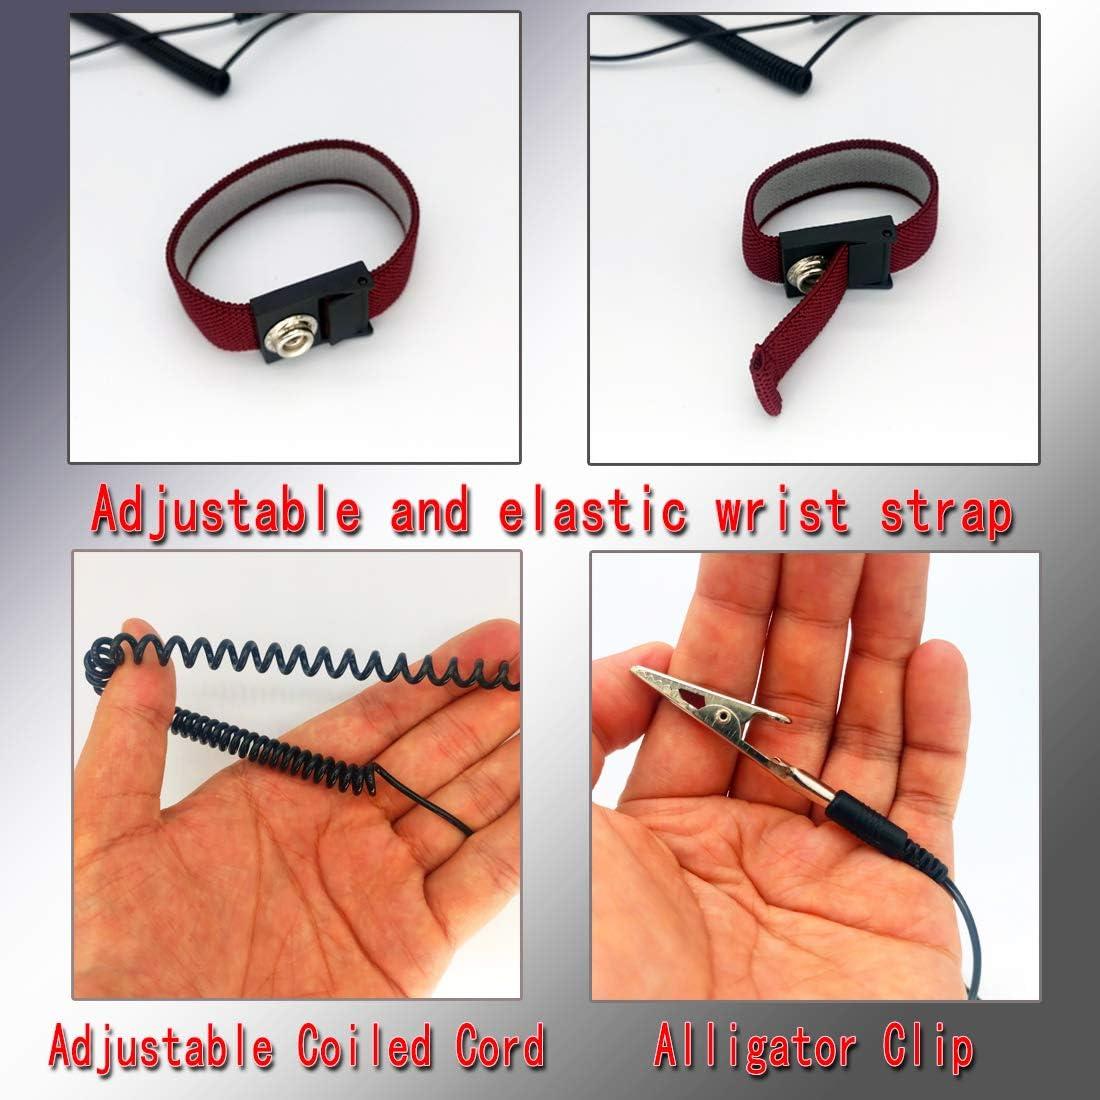 Feezi Anti Static Wrist Strap 180 cm//6 Feet Alligator Clip with Adjustable Coiled Cord ESD Anti Shock Wristband Bracelet